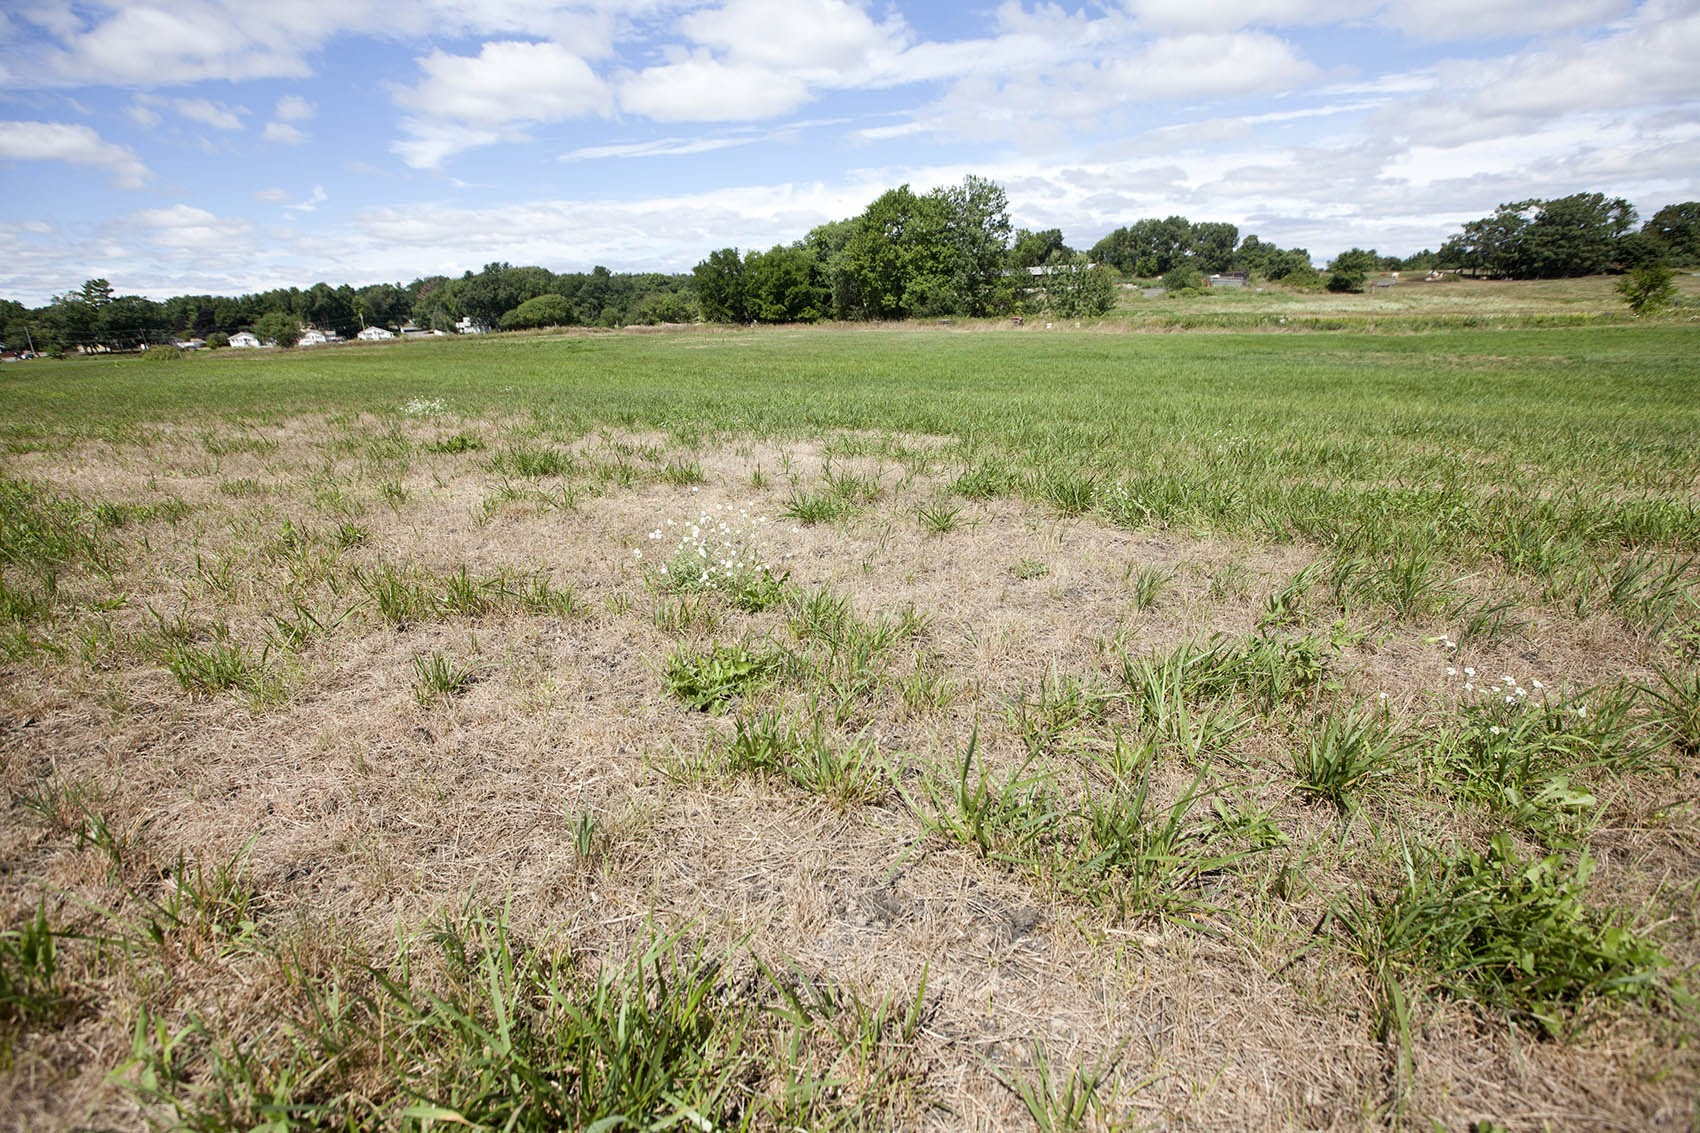 Drought-affected fields at Shaw Farm in Dracut, Massachusetts. (Joe Difazio for WBUR)